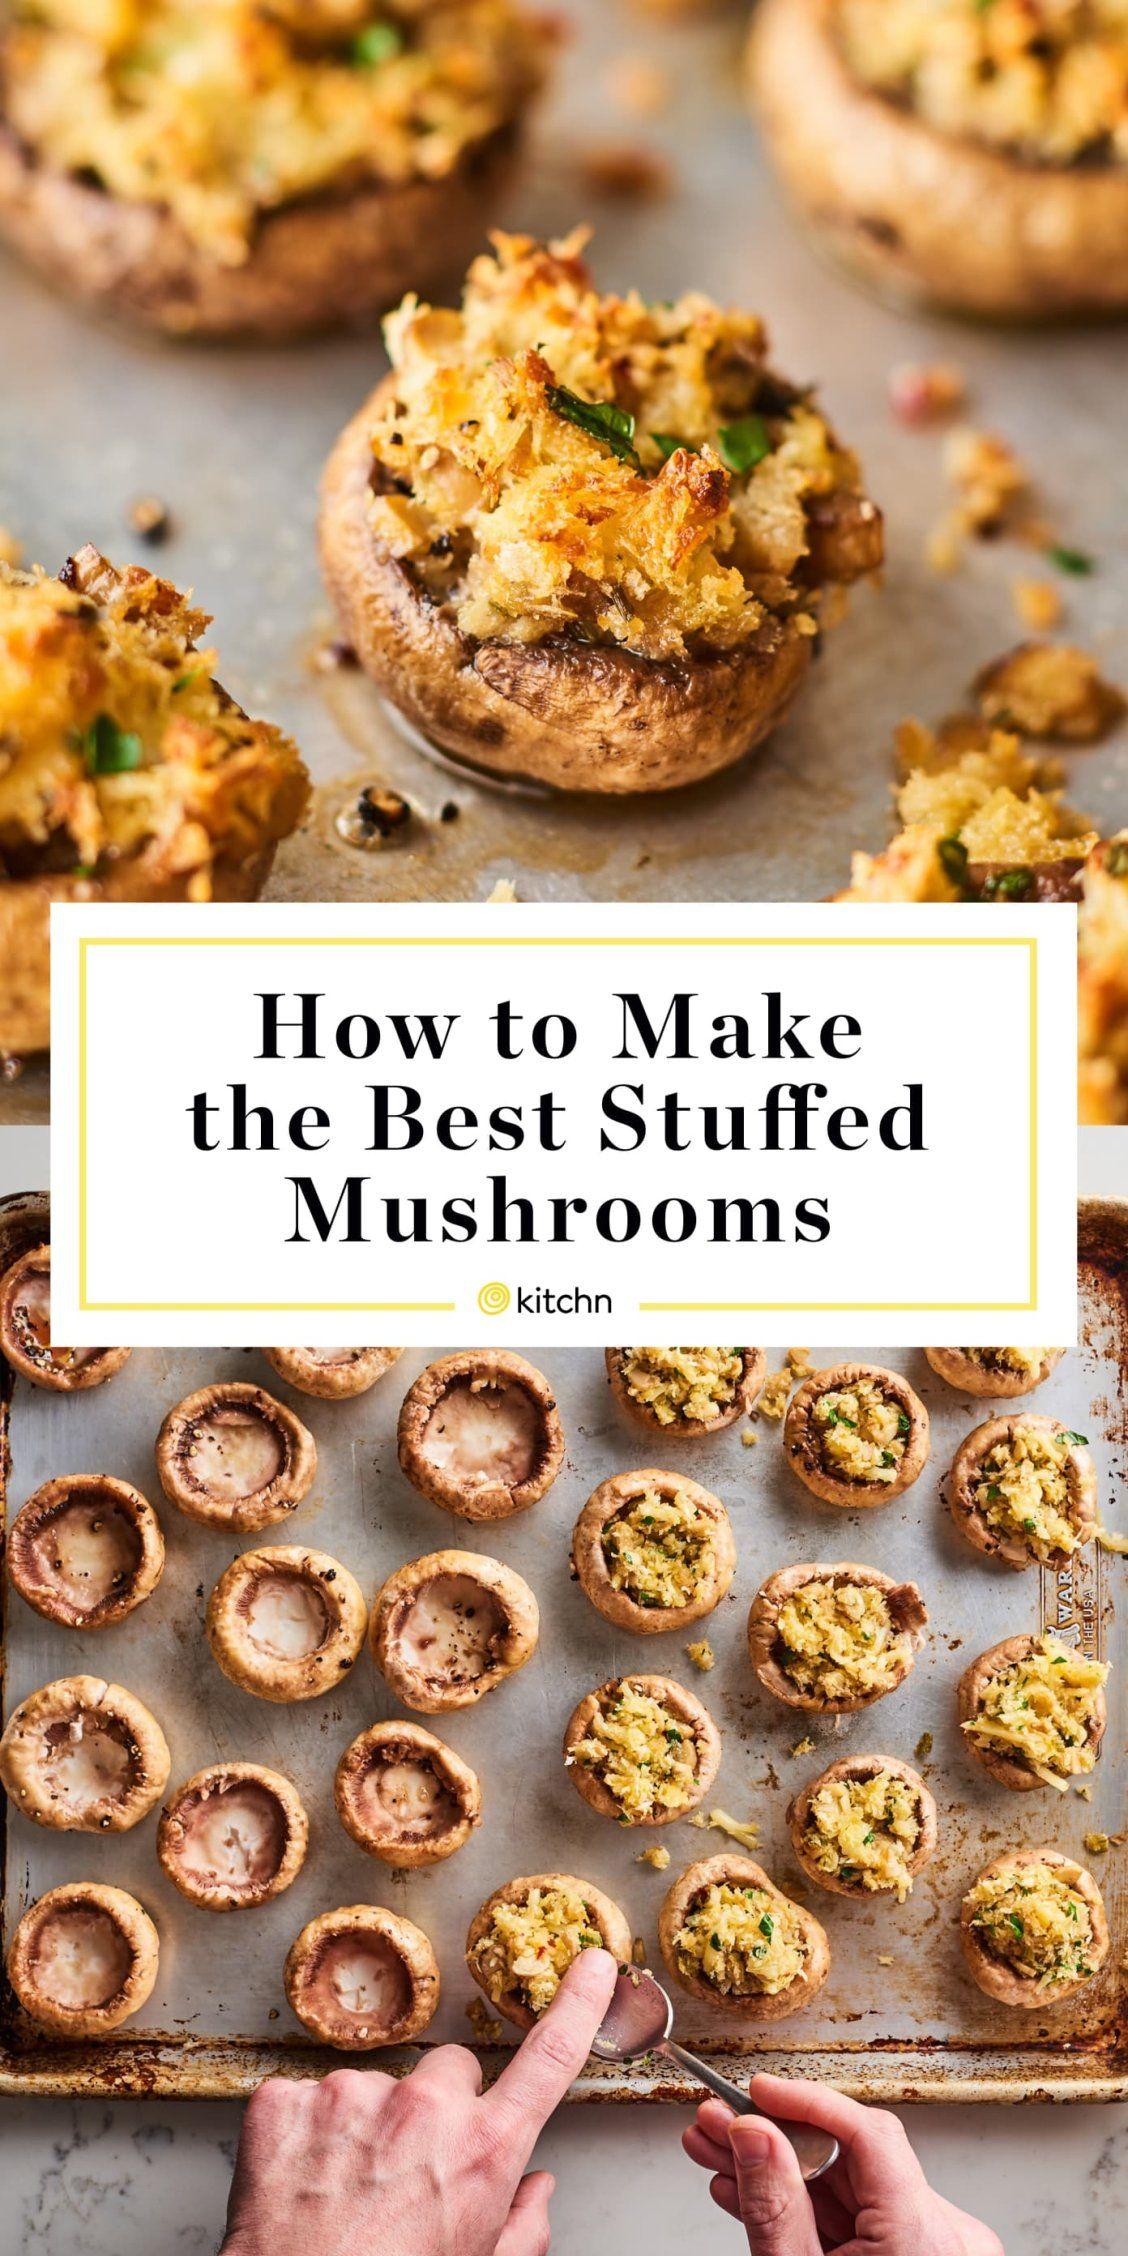 How To Make The Best Stuffed Mushrooms Recipe Best Stuffed Mushrooms Stuffed Mushrooms Recipes